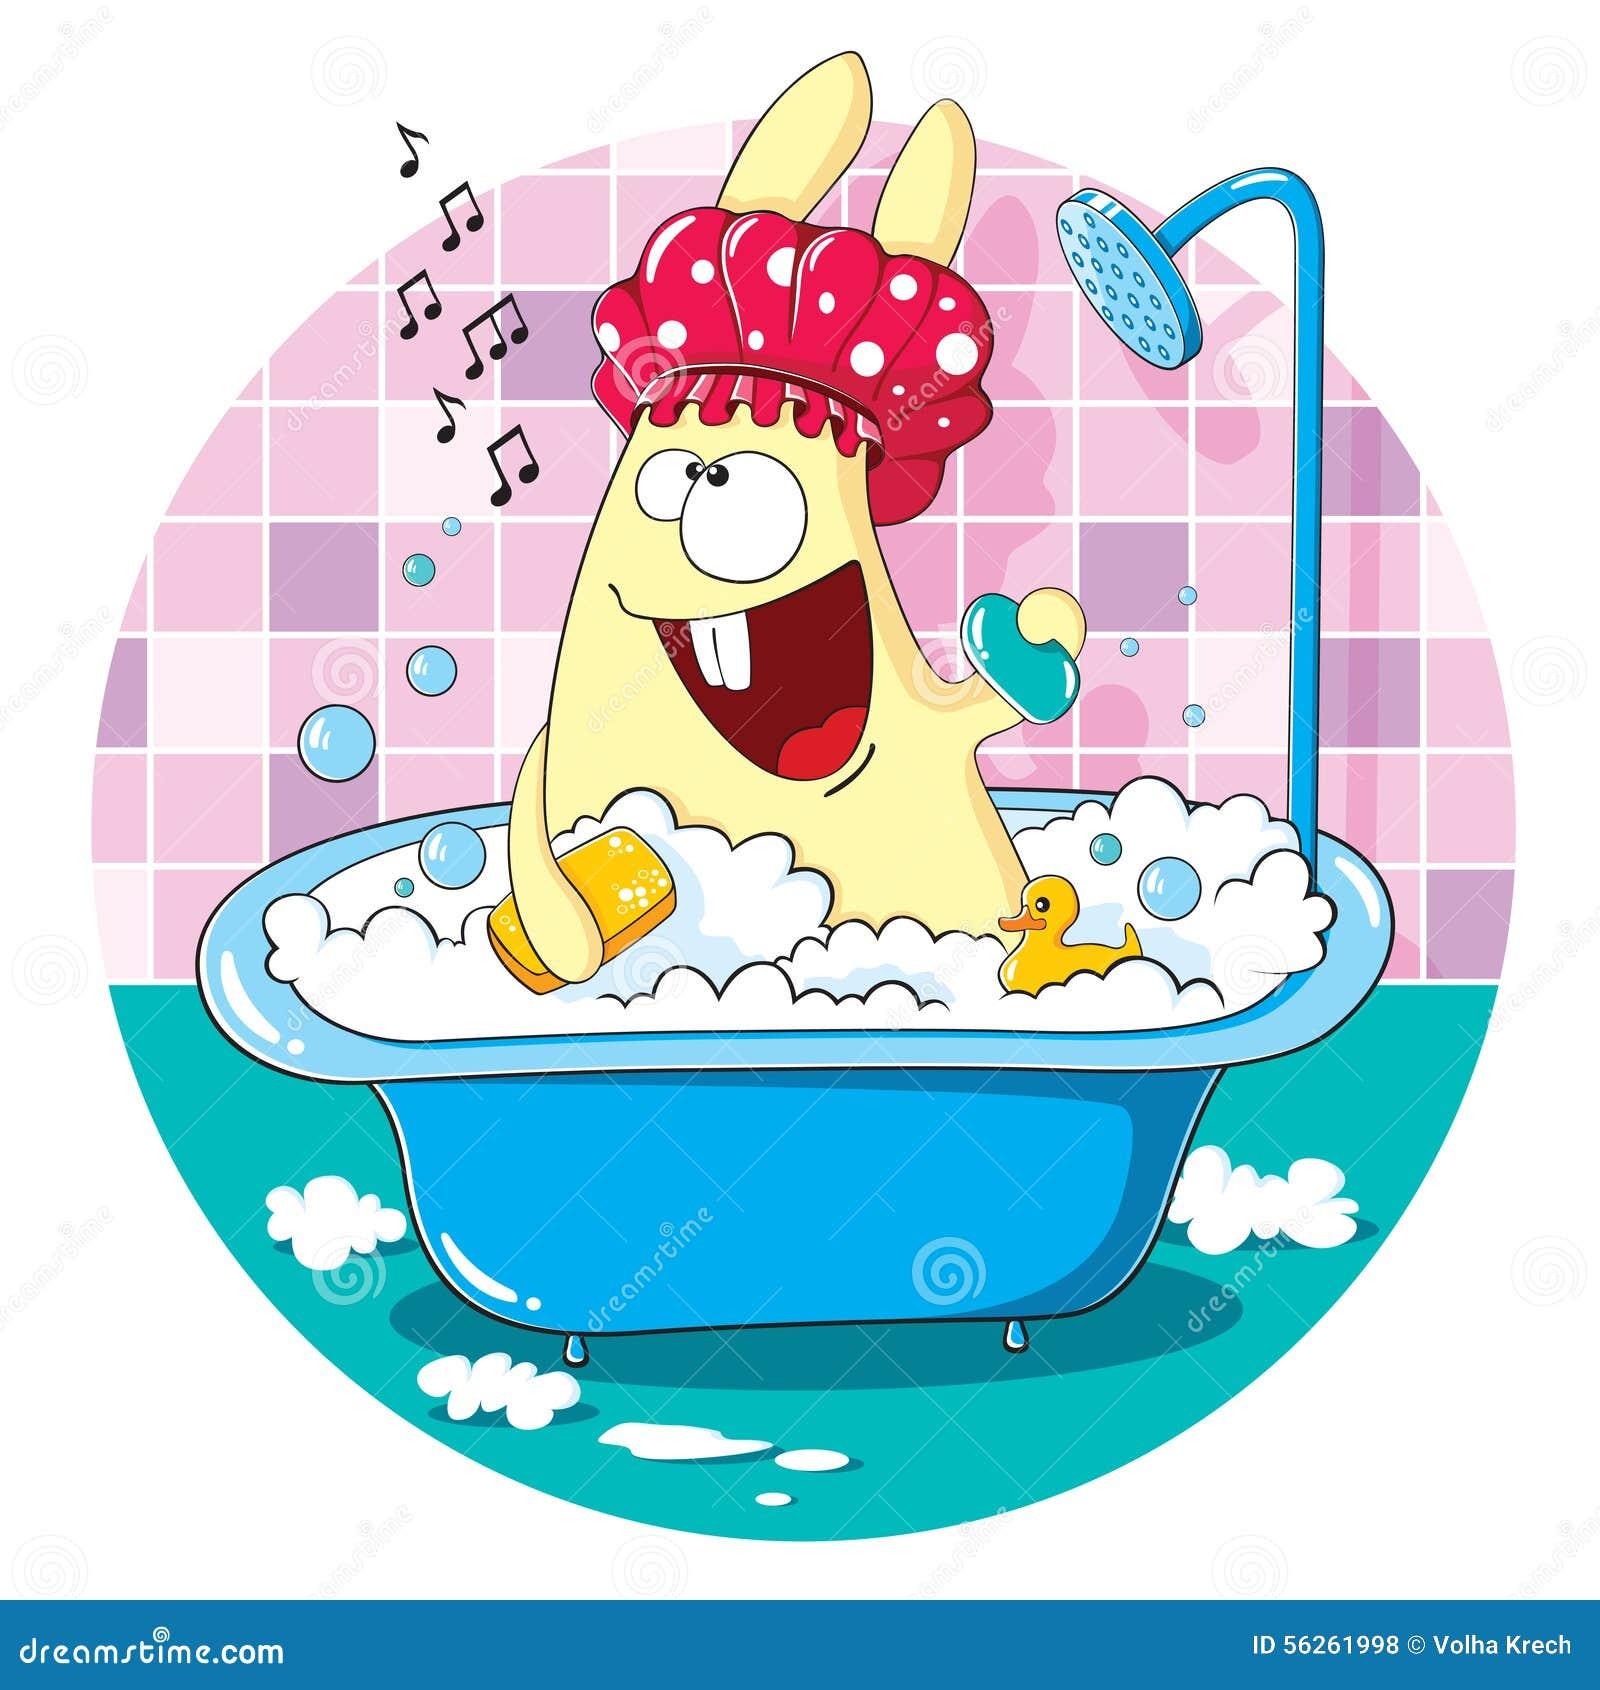 Cartoon Bunny Taking A Bath Stock Vector - Image: 56261998